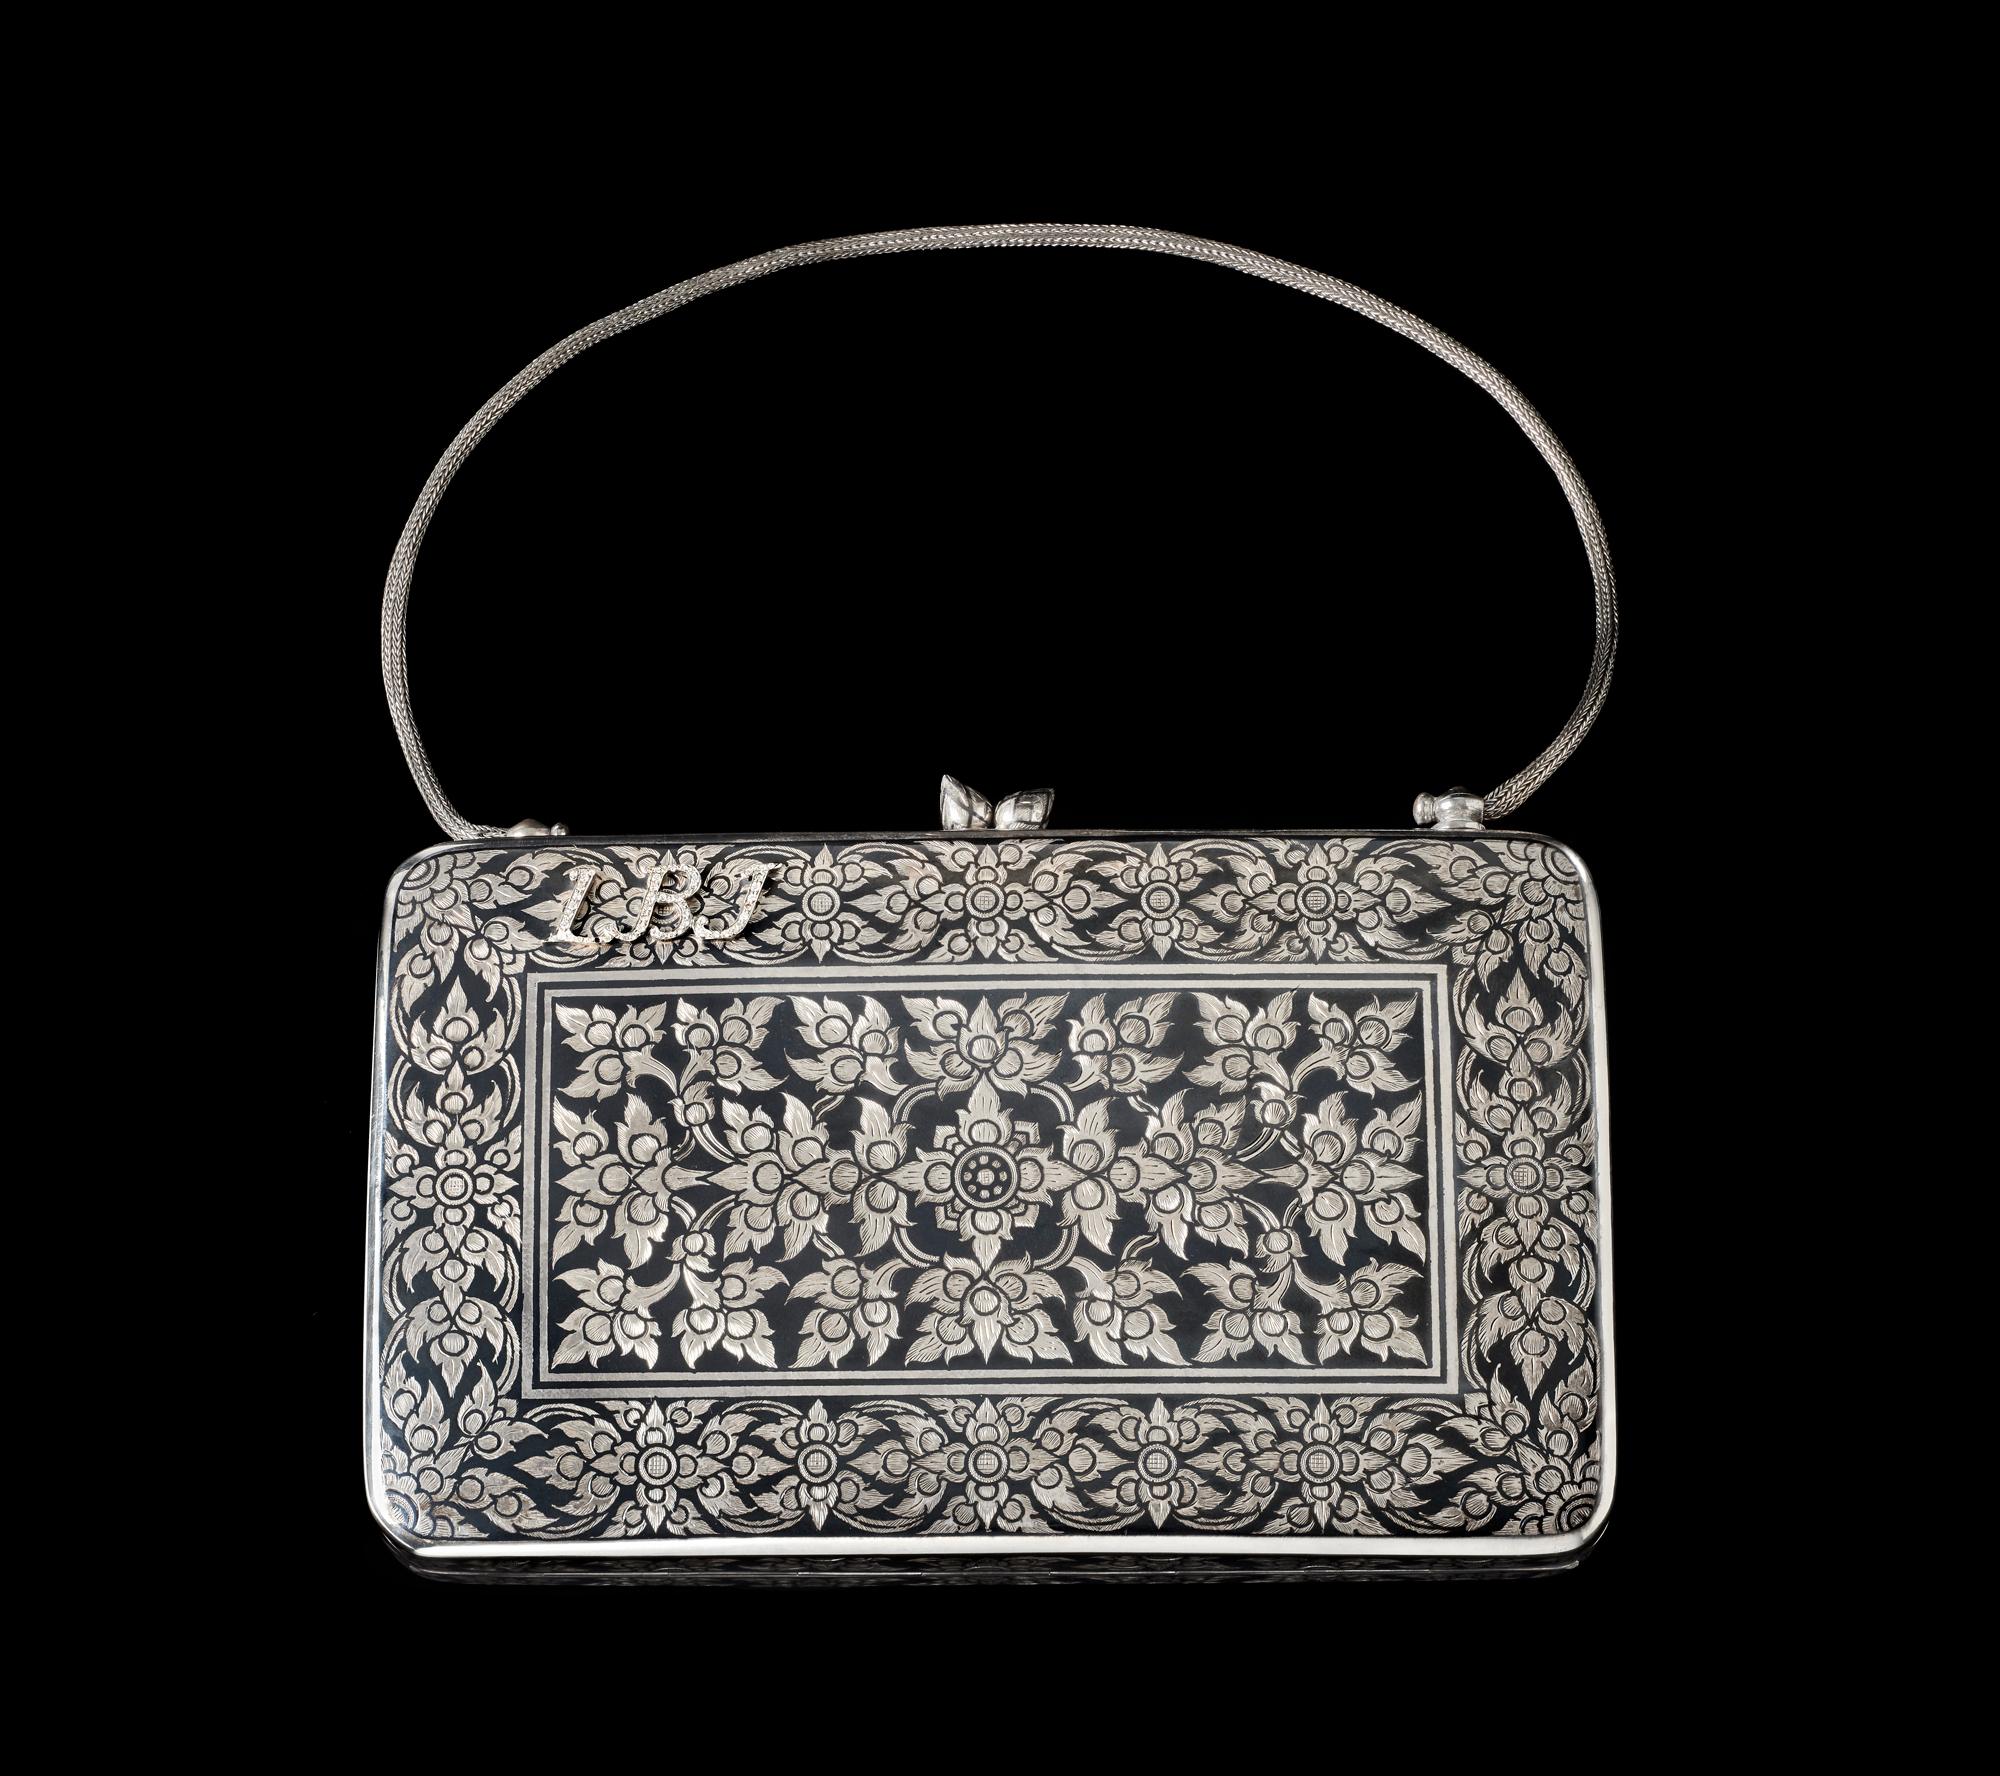 "Silver Niello Purse Embellished with Diamonds Gift from Queen Sirikit to First Lady Claudia ""Lady Bird"" Johnson, 1966 12.1 x 17.7 x 3.6 cm Courtesy of the Lyndon B. Johnson Presidential Library and Museum; 1966.51.6  กระเป๋าถมเงินประดับเพชร ของขวัญพระราชทานจากสมเด็จพระนางเจ้าสิริกิติ์ พระบรมราชินีนาถ แก่นางคลอเดีย ""เลดี้ เบิร์ด"" จอห์นสัน สุภาพสตรีหมายเลขหนึ่ง พ.ศ. ๒๕๐๙ ๑๒.๑ x ๑๗.๗ x ๓.๖ ซม. ได้รับความอนุเคราะห์จากพิพิธภัณฑ์และหอสมุดประธานาธิบดีลินดอน บี. จอห์นสัน; 1966.51.6"